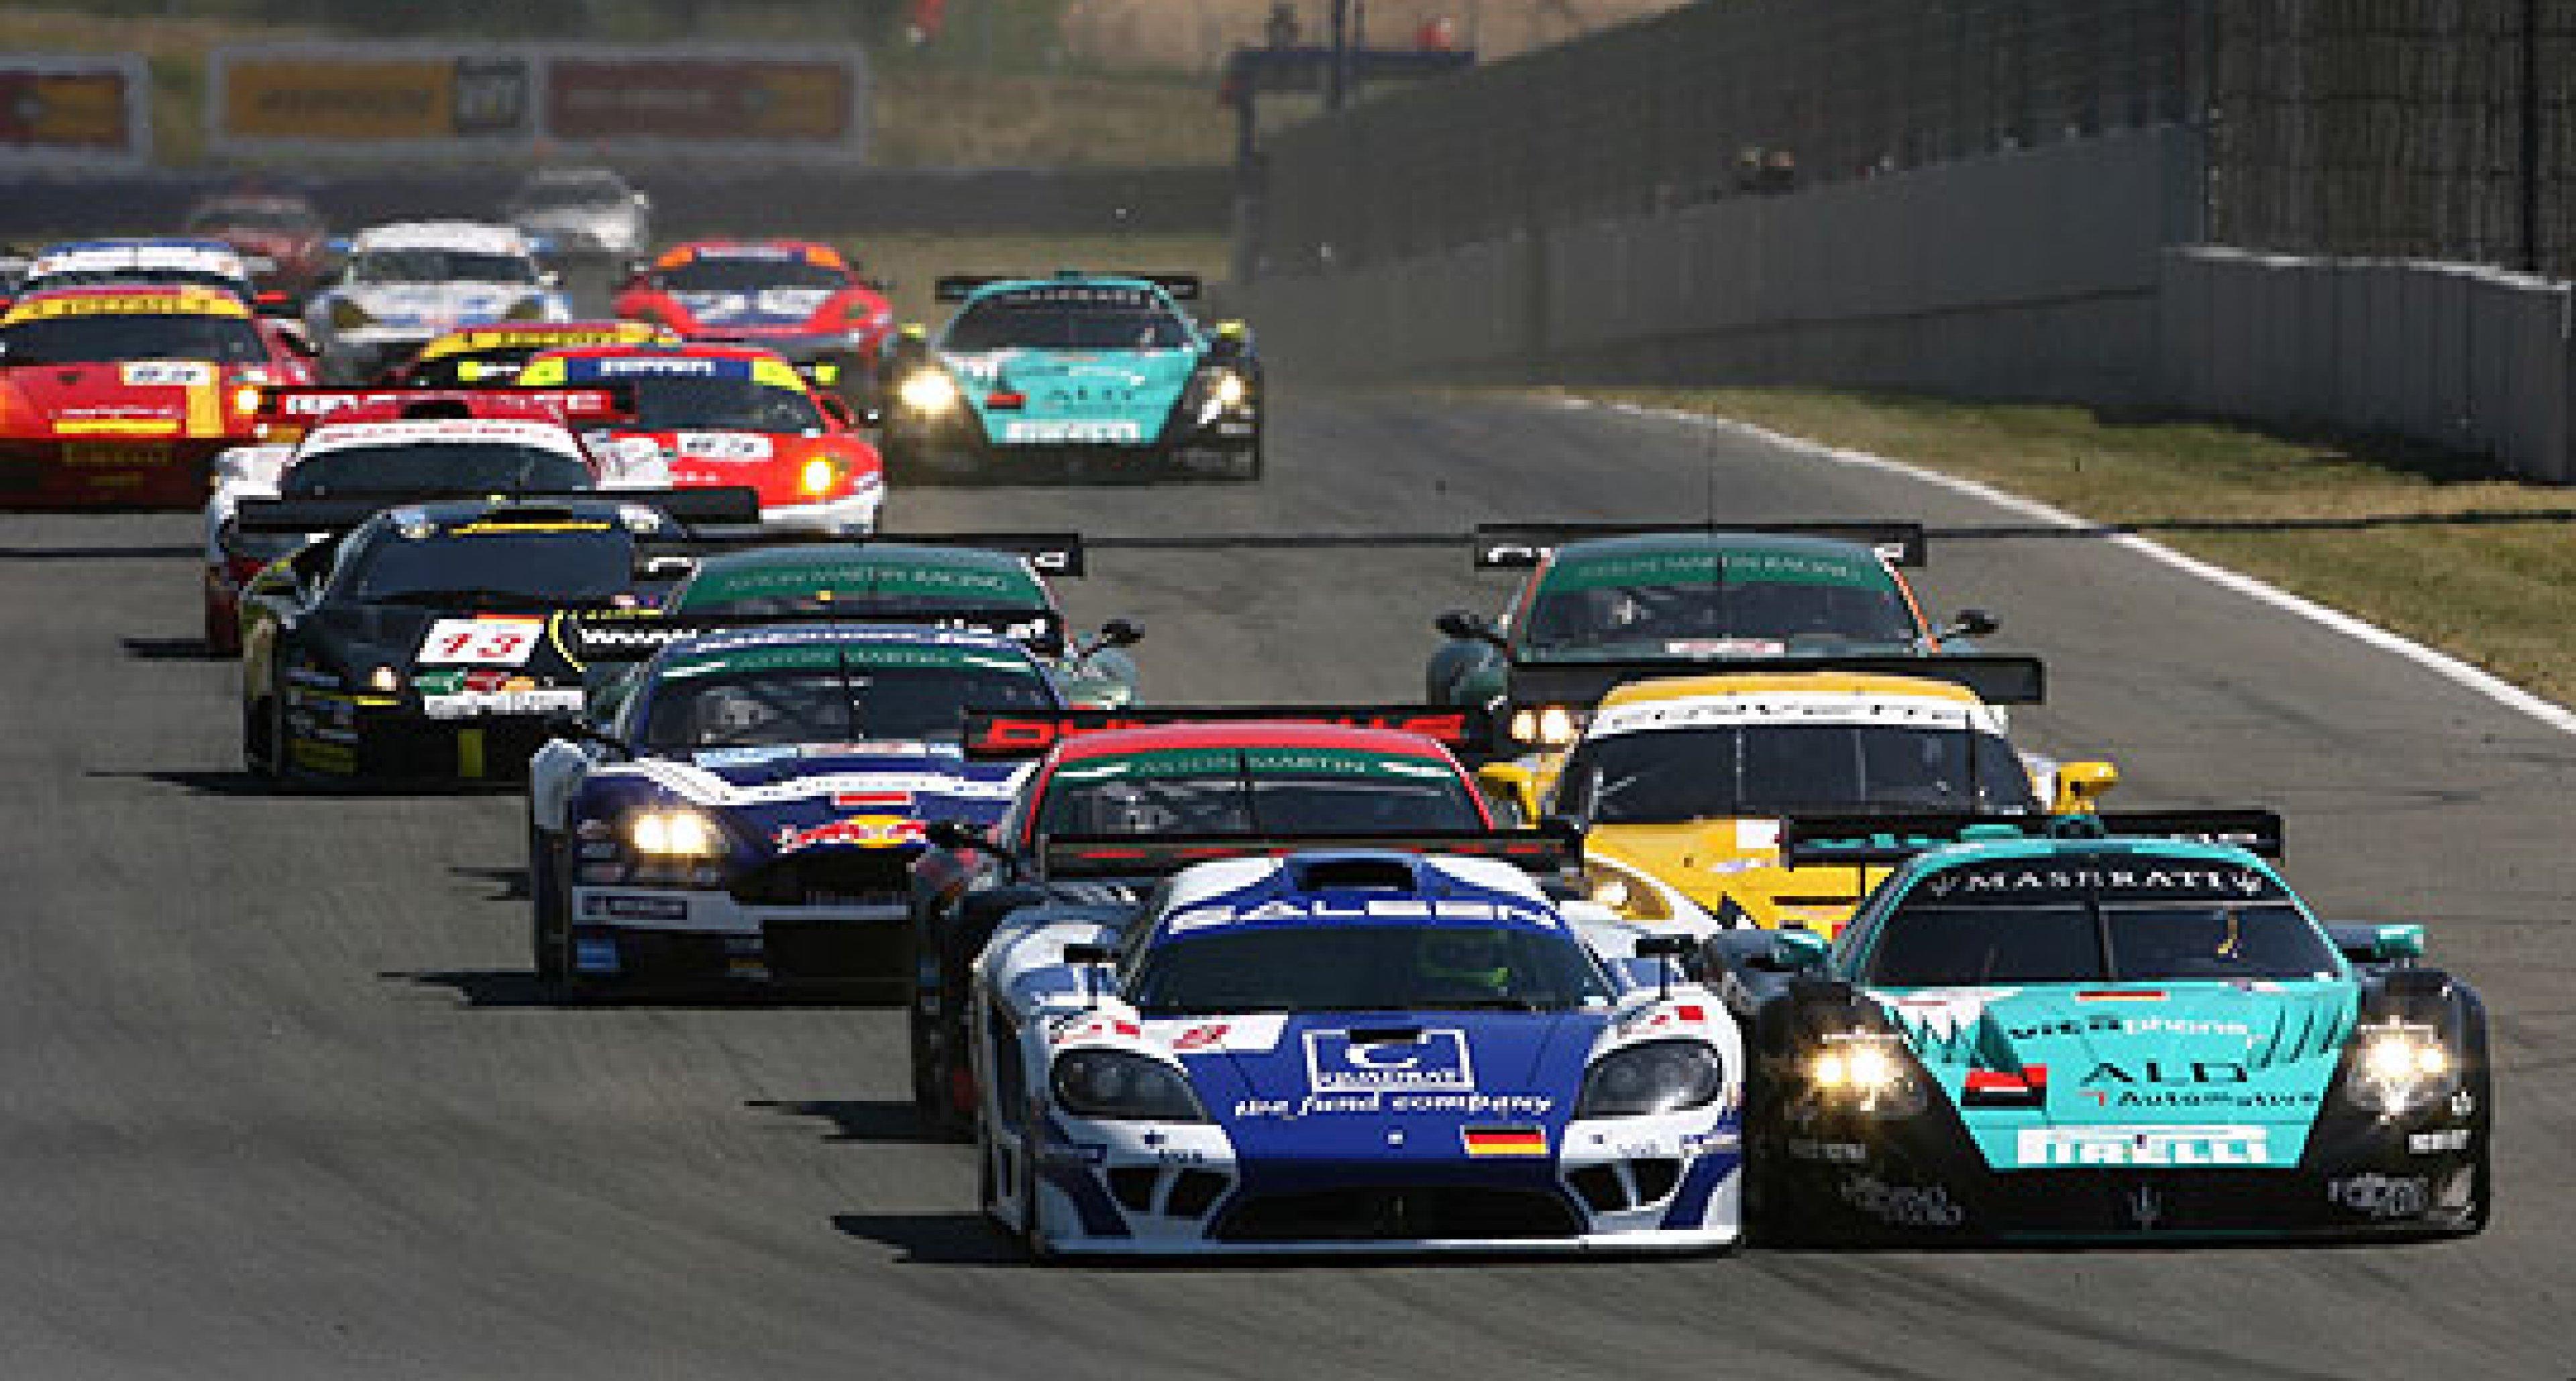 Victory for Maserati in FIA GT at Oschersleben